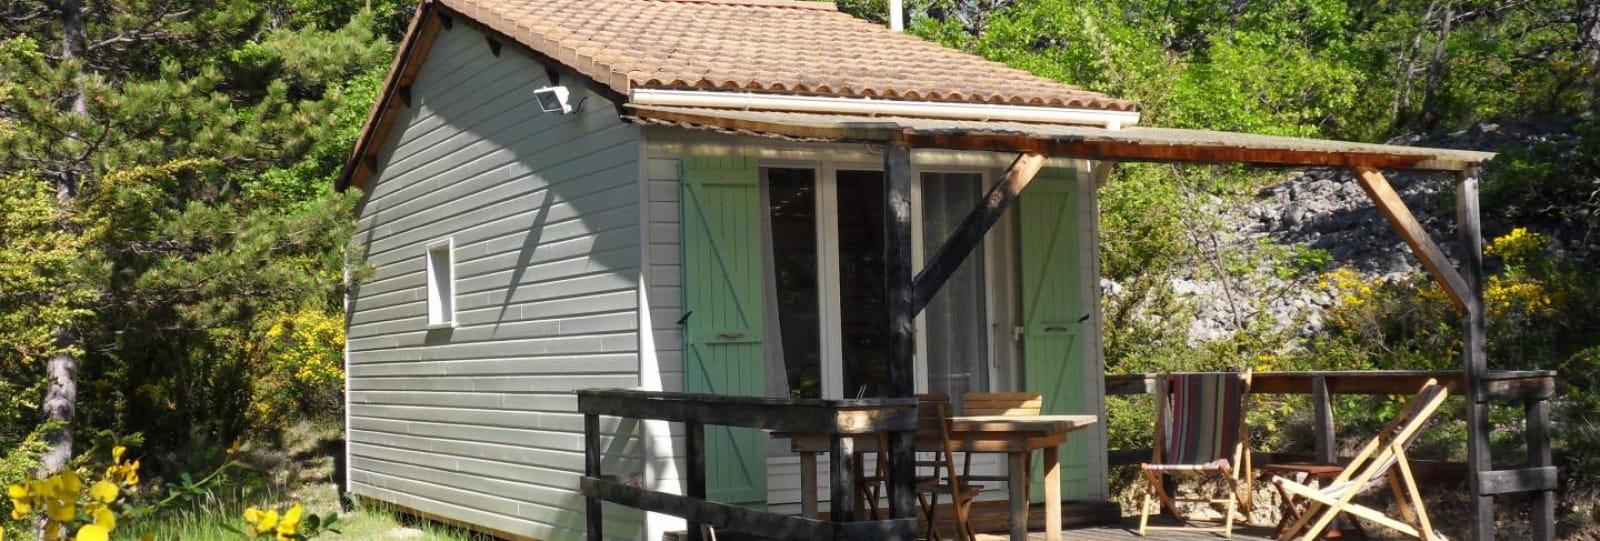 chalet vert et terrasse